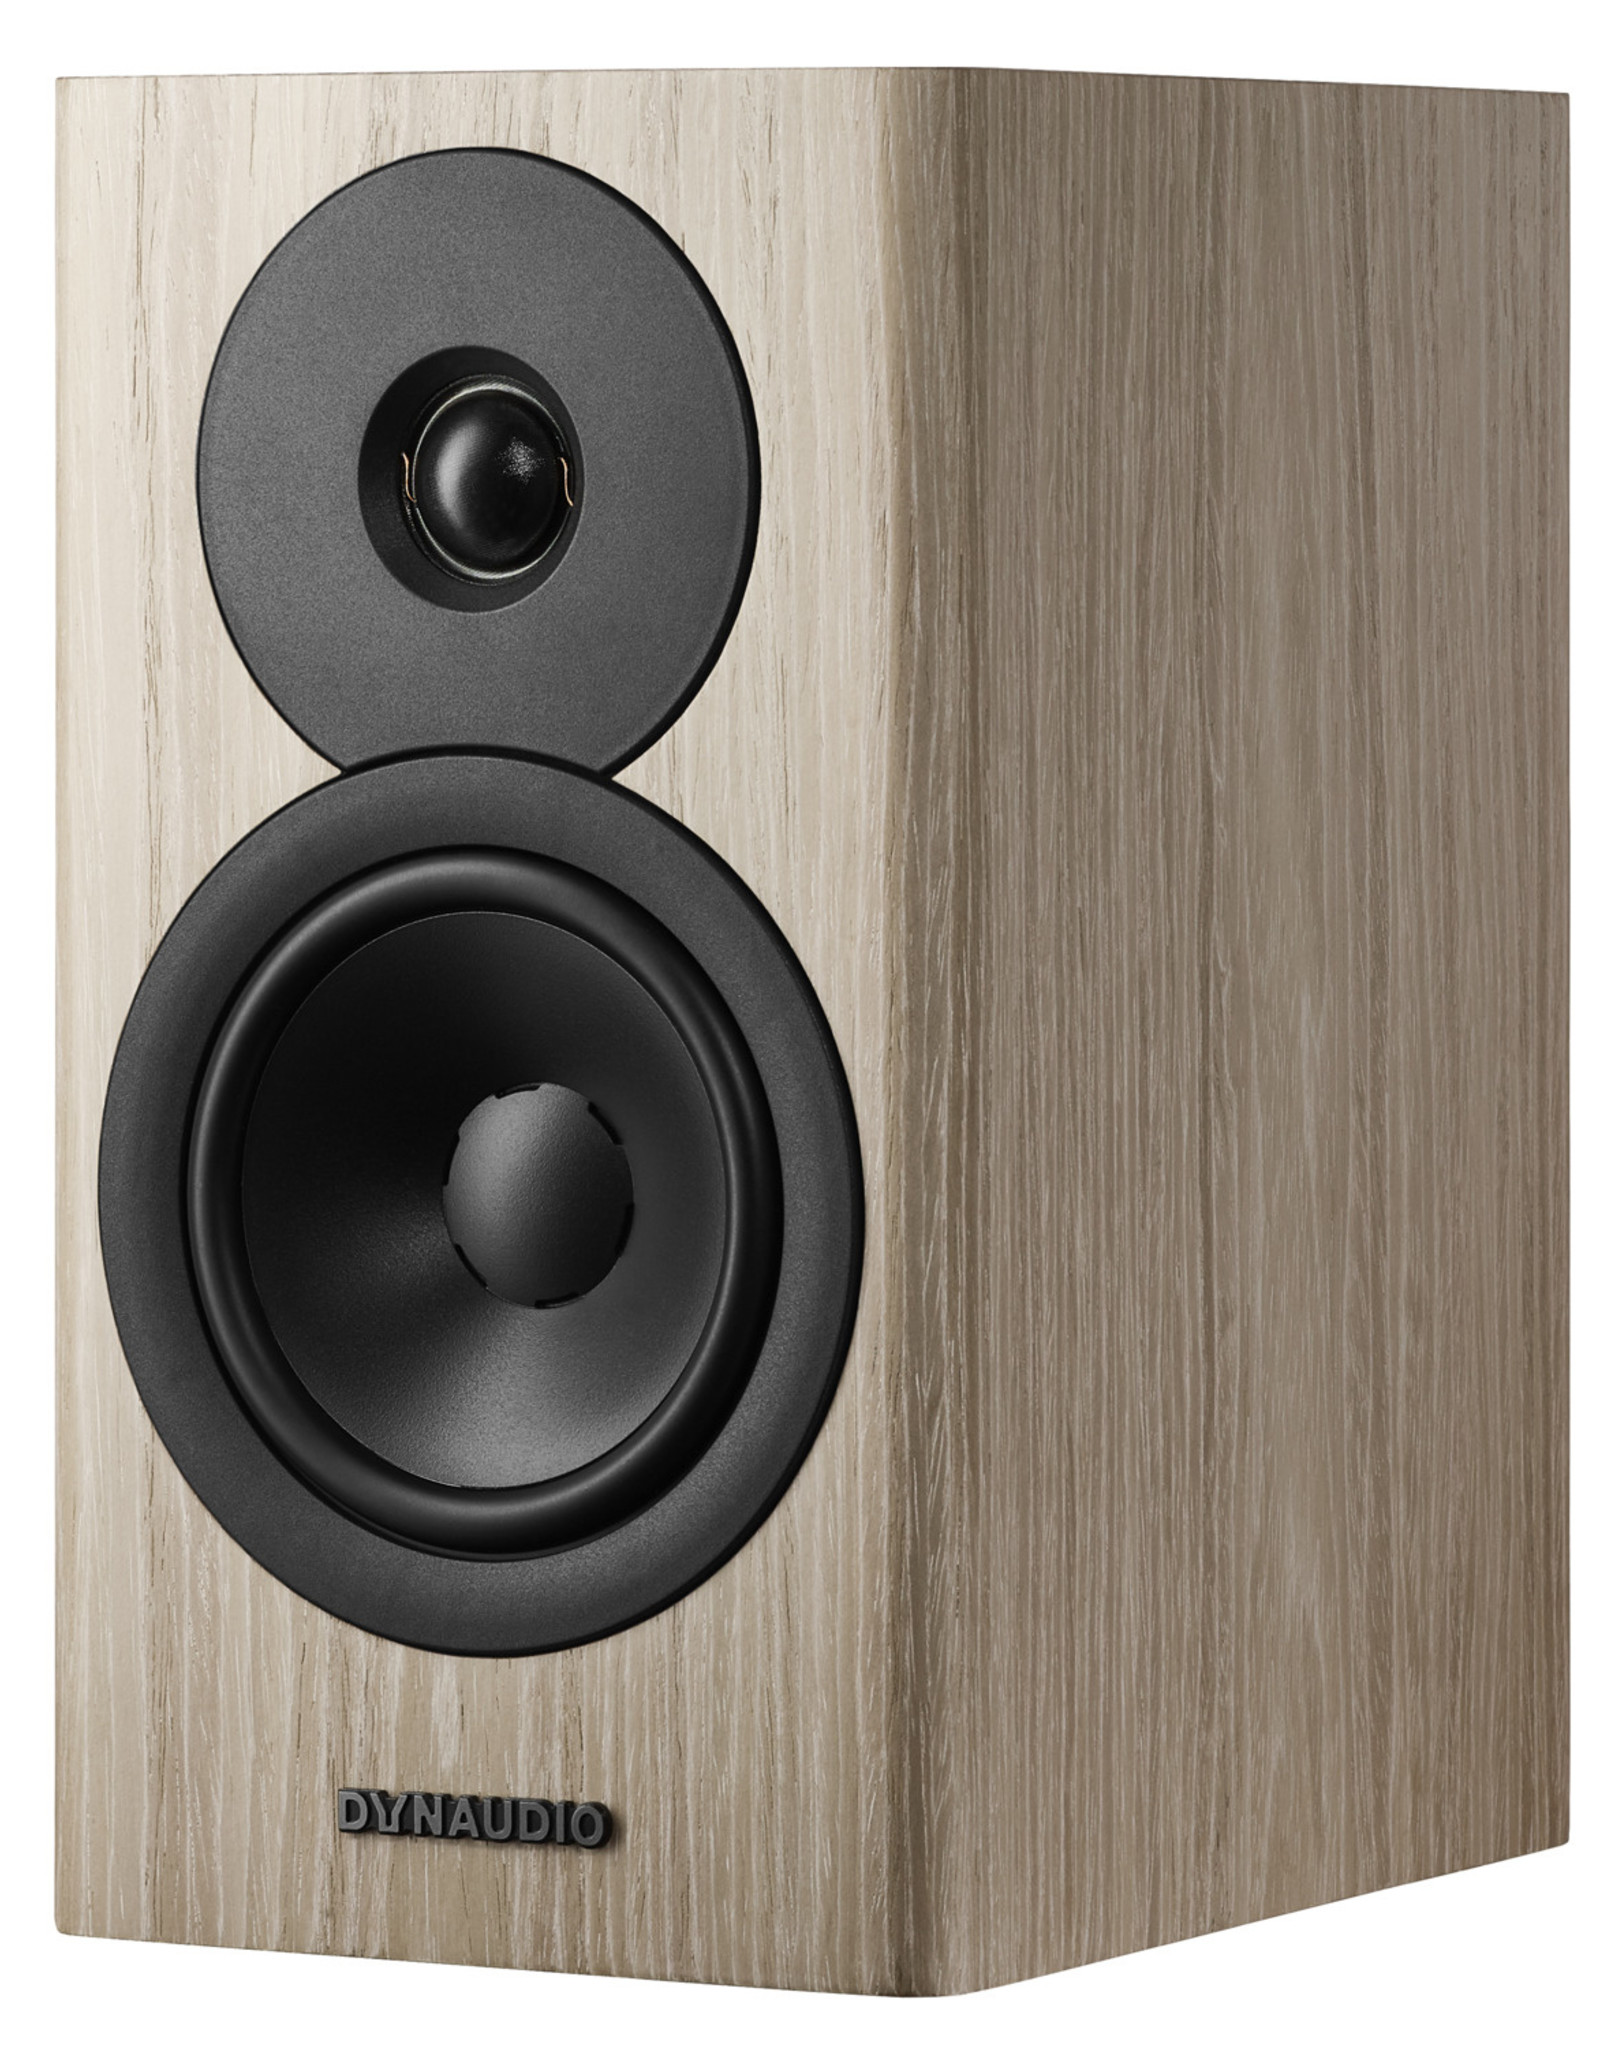 Dynaudio Dynaudio Evoke 10 Bookshelf Speakers Blonde Wood EX-DEMO (NOT USED)